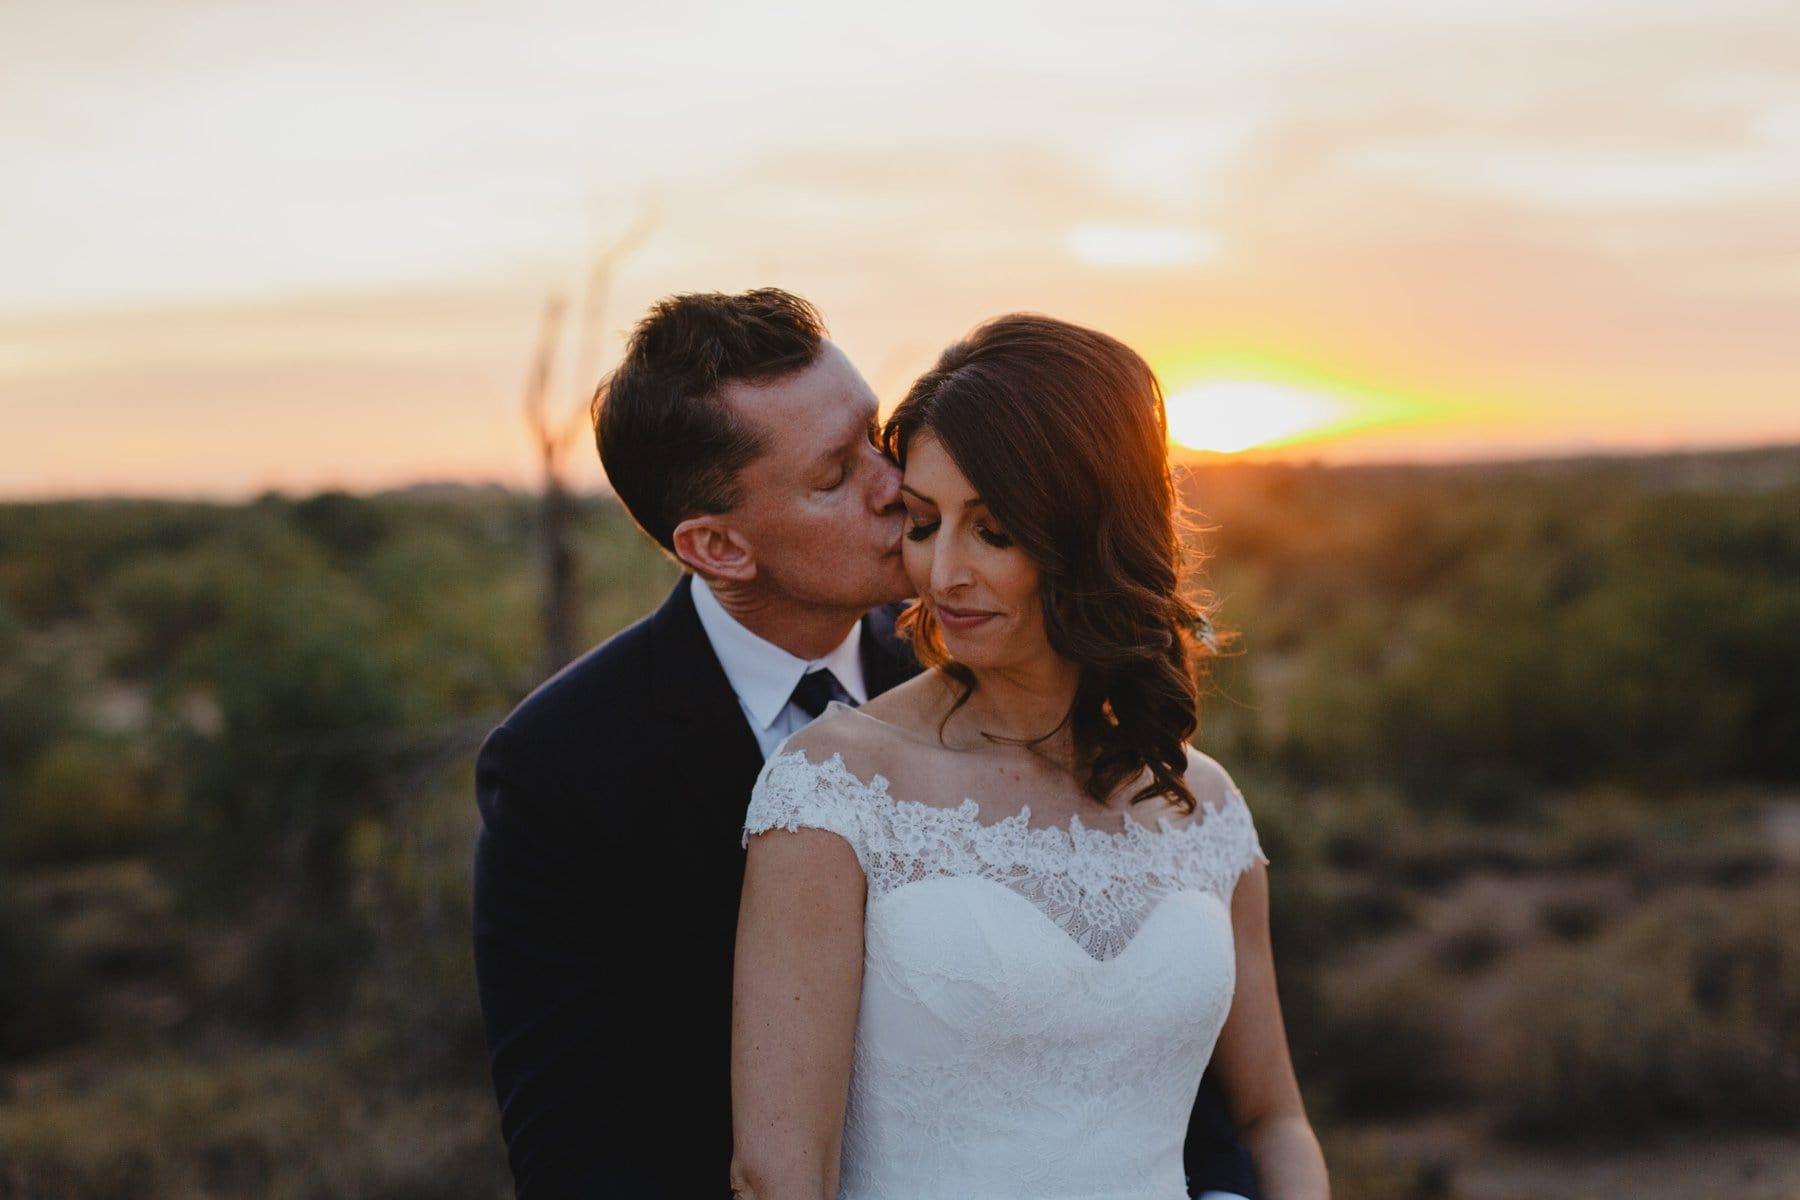 desert elopement photos in Arizona